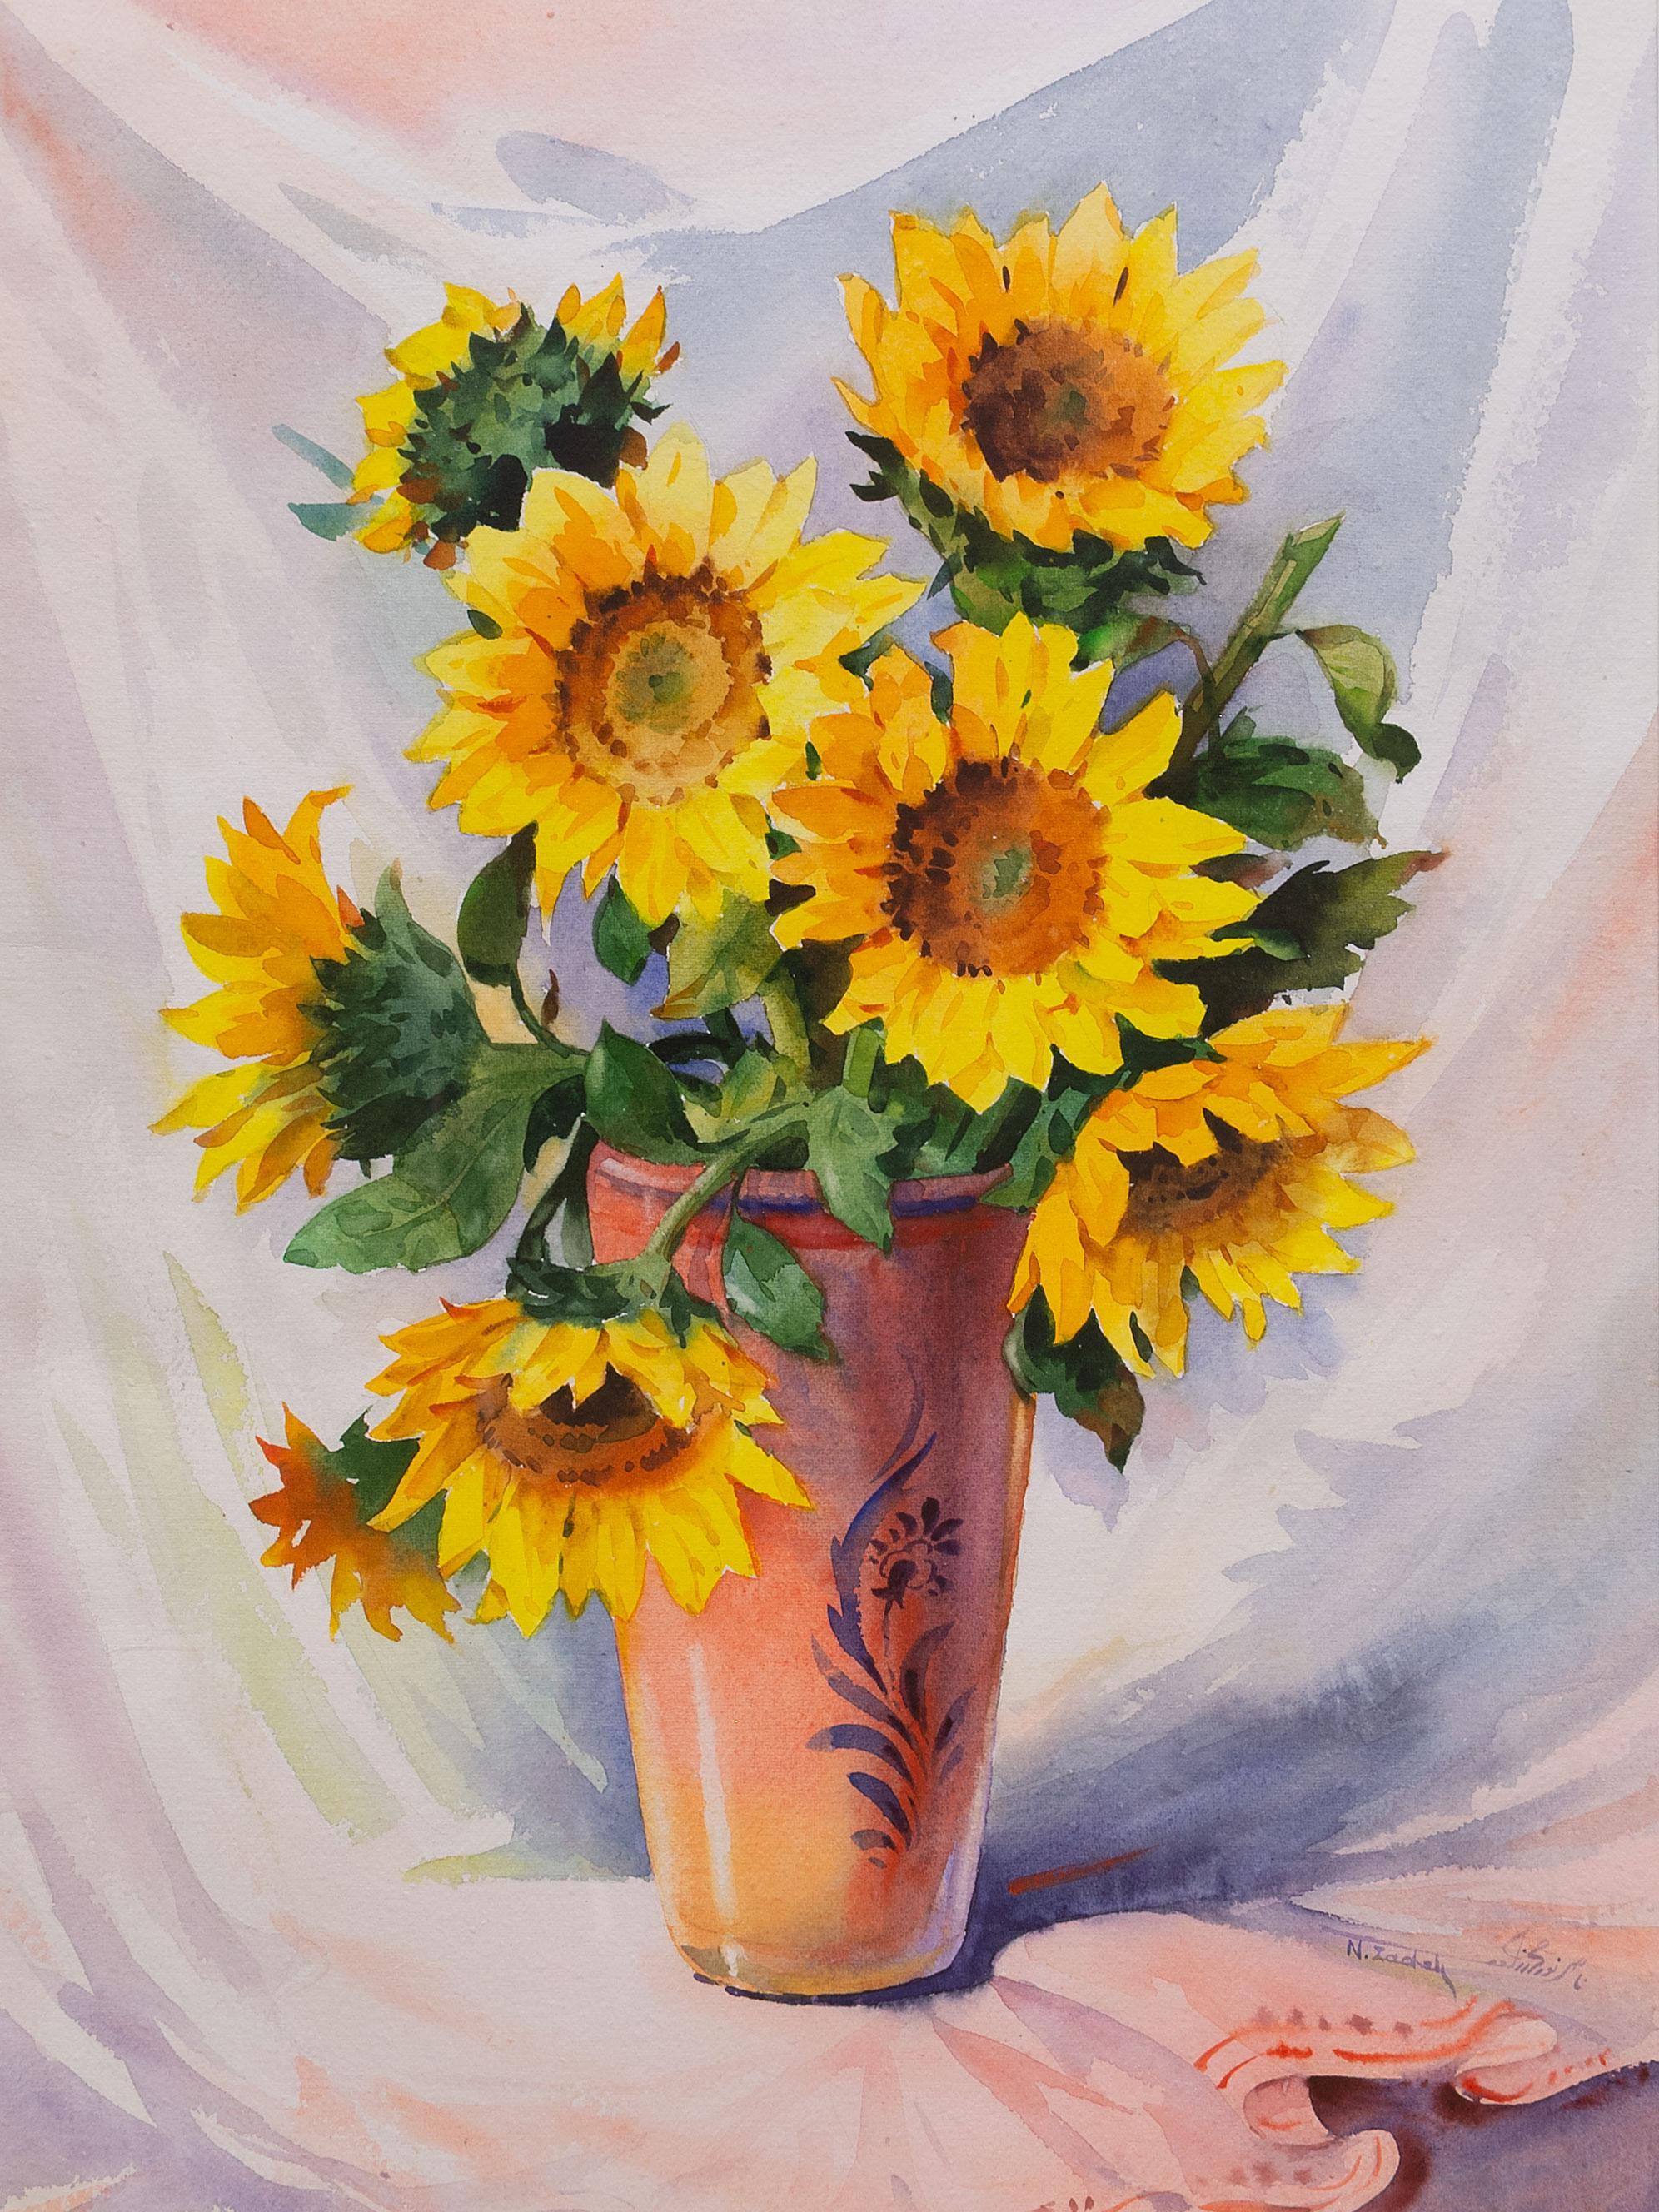 Zadeh (SA, born 1953) Watercolour, Sunflowers, Signed, 74 x 53